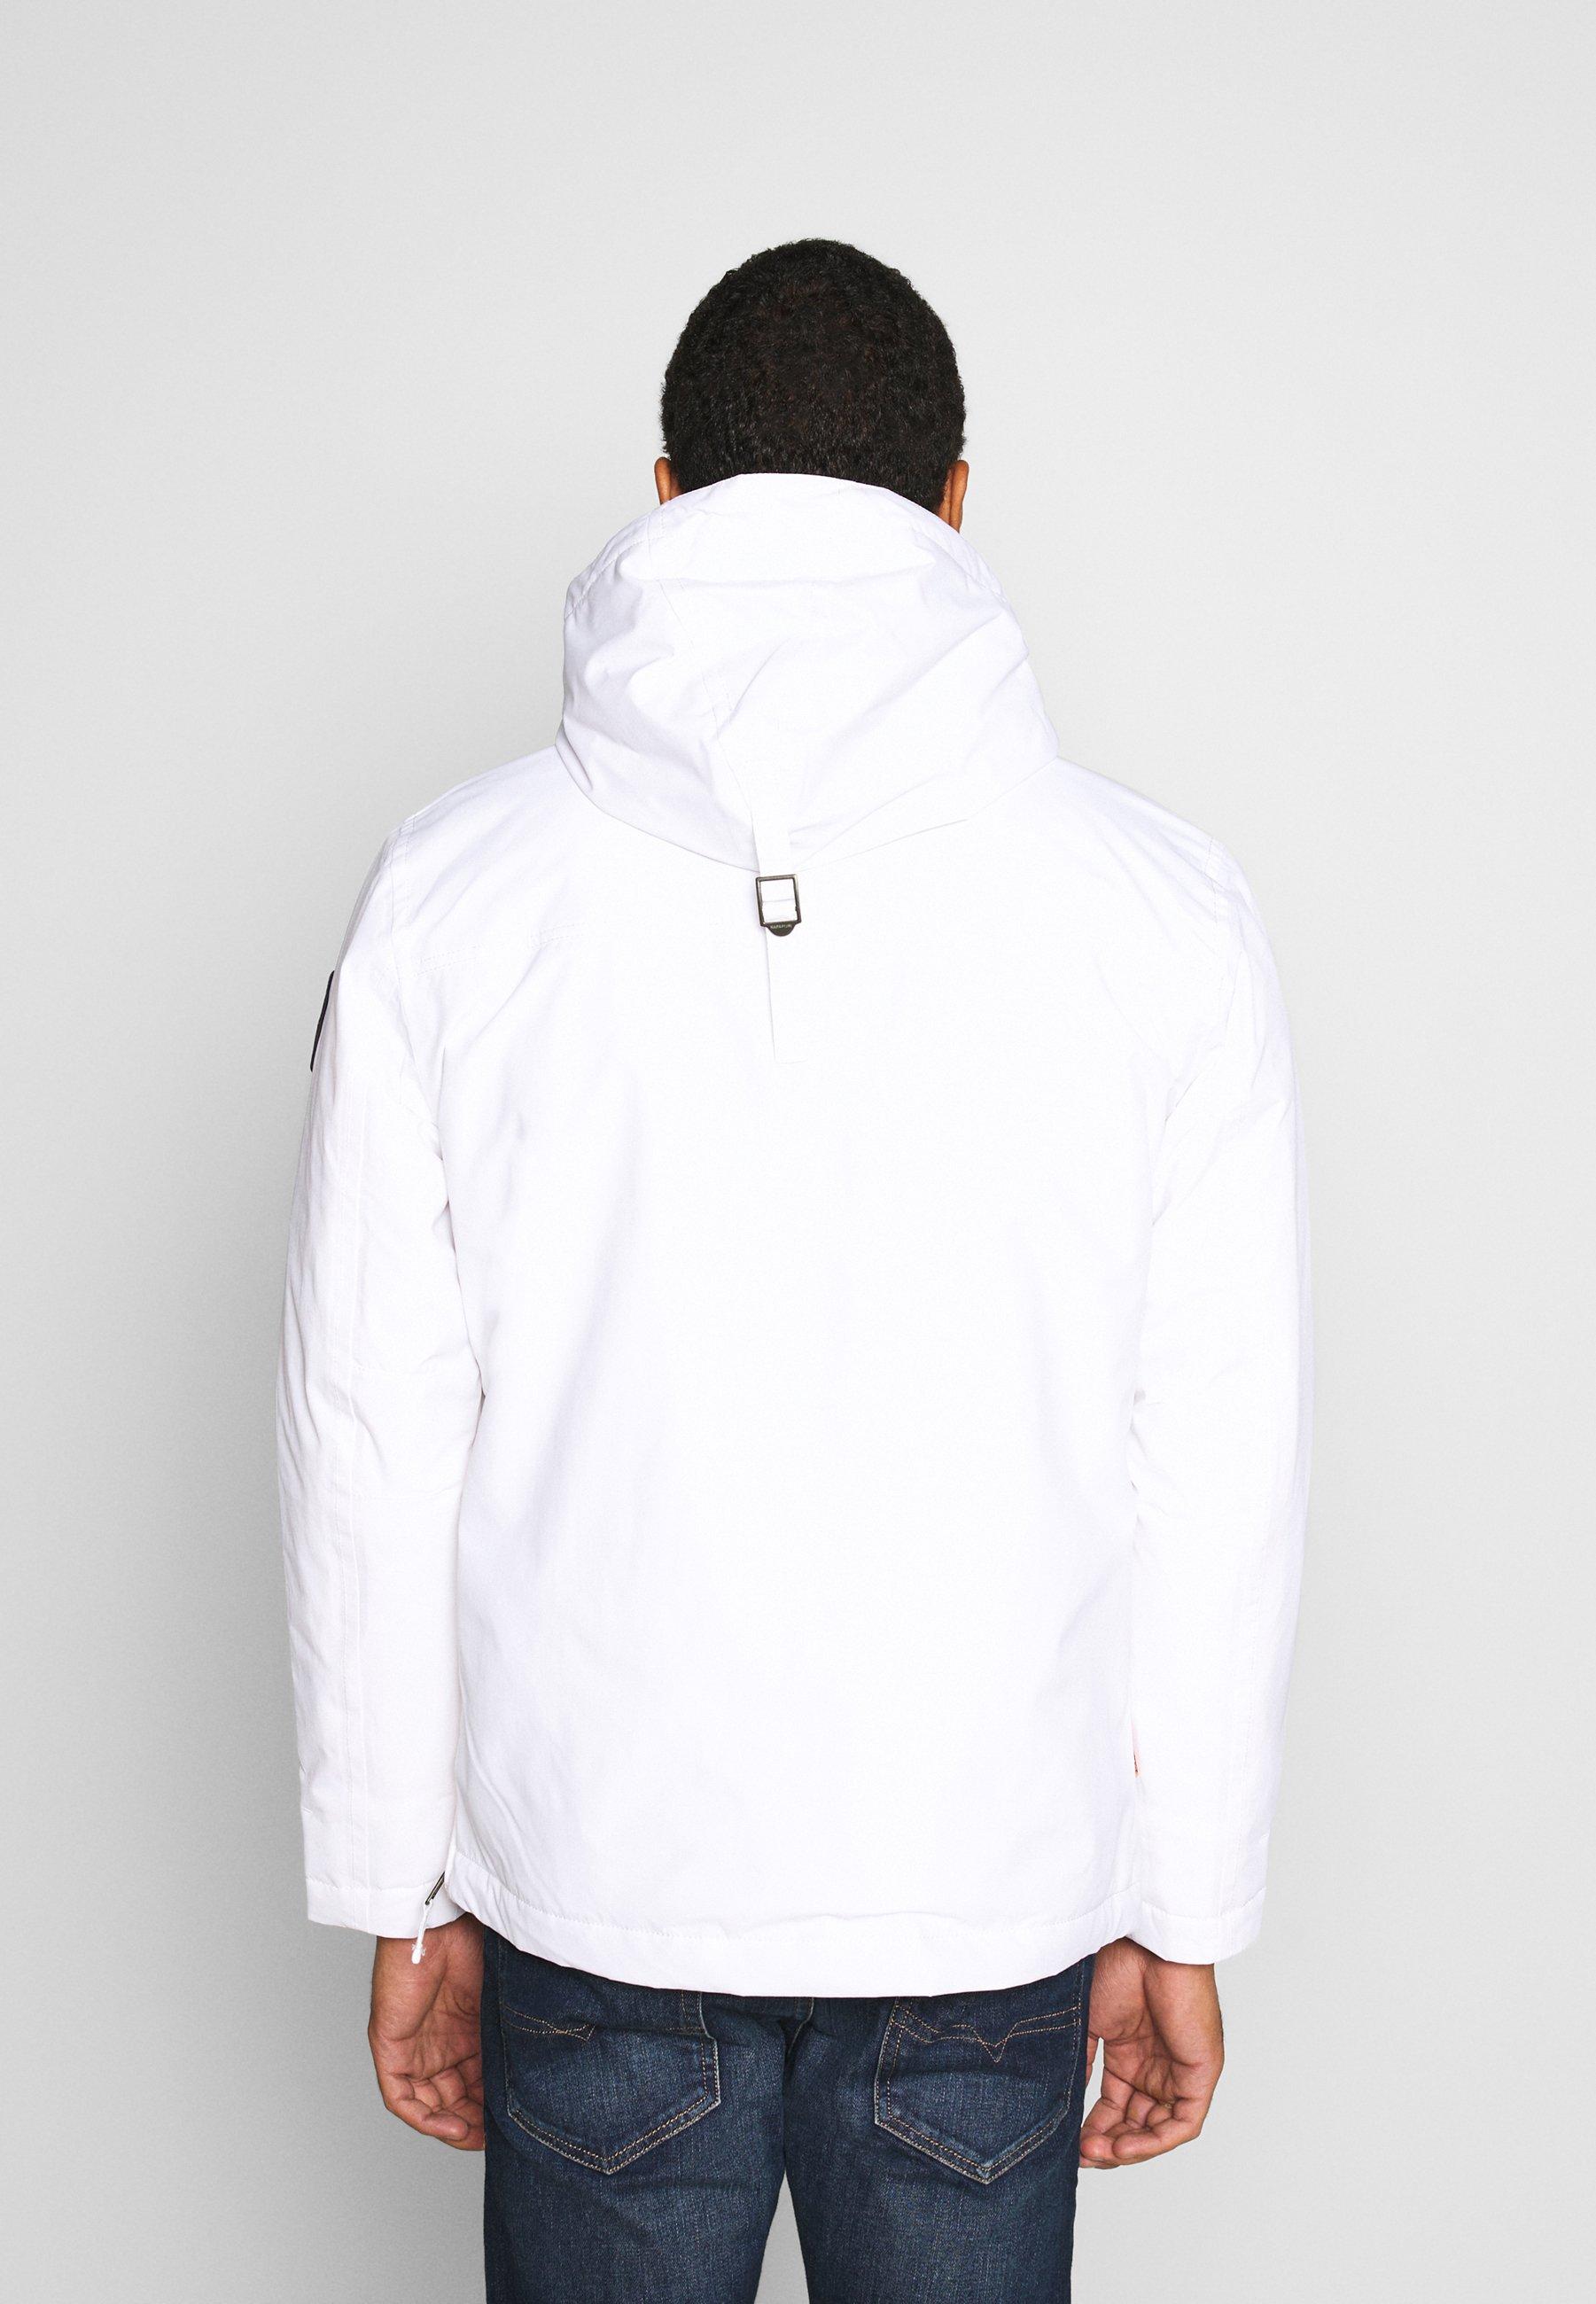 Napapijri RAINFOREST WINTER Übergangsjacke brightwhite/weiß